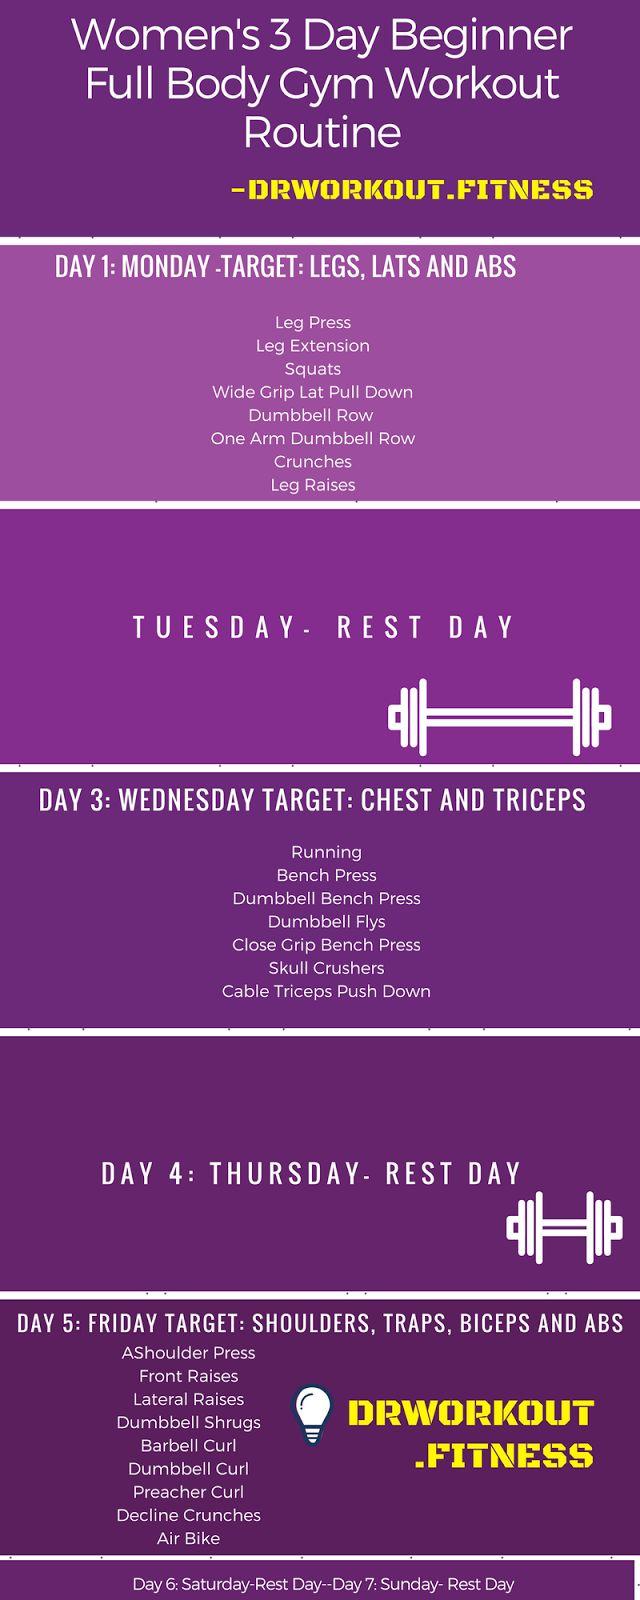 Women's 3 Day Beginner Full Body Gym Workout plan